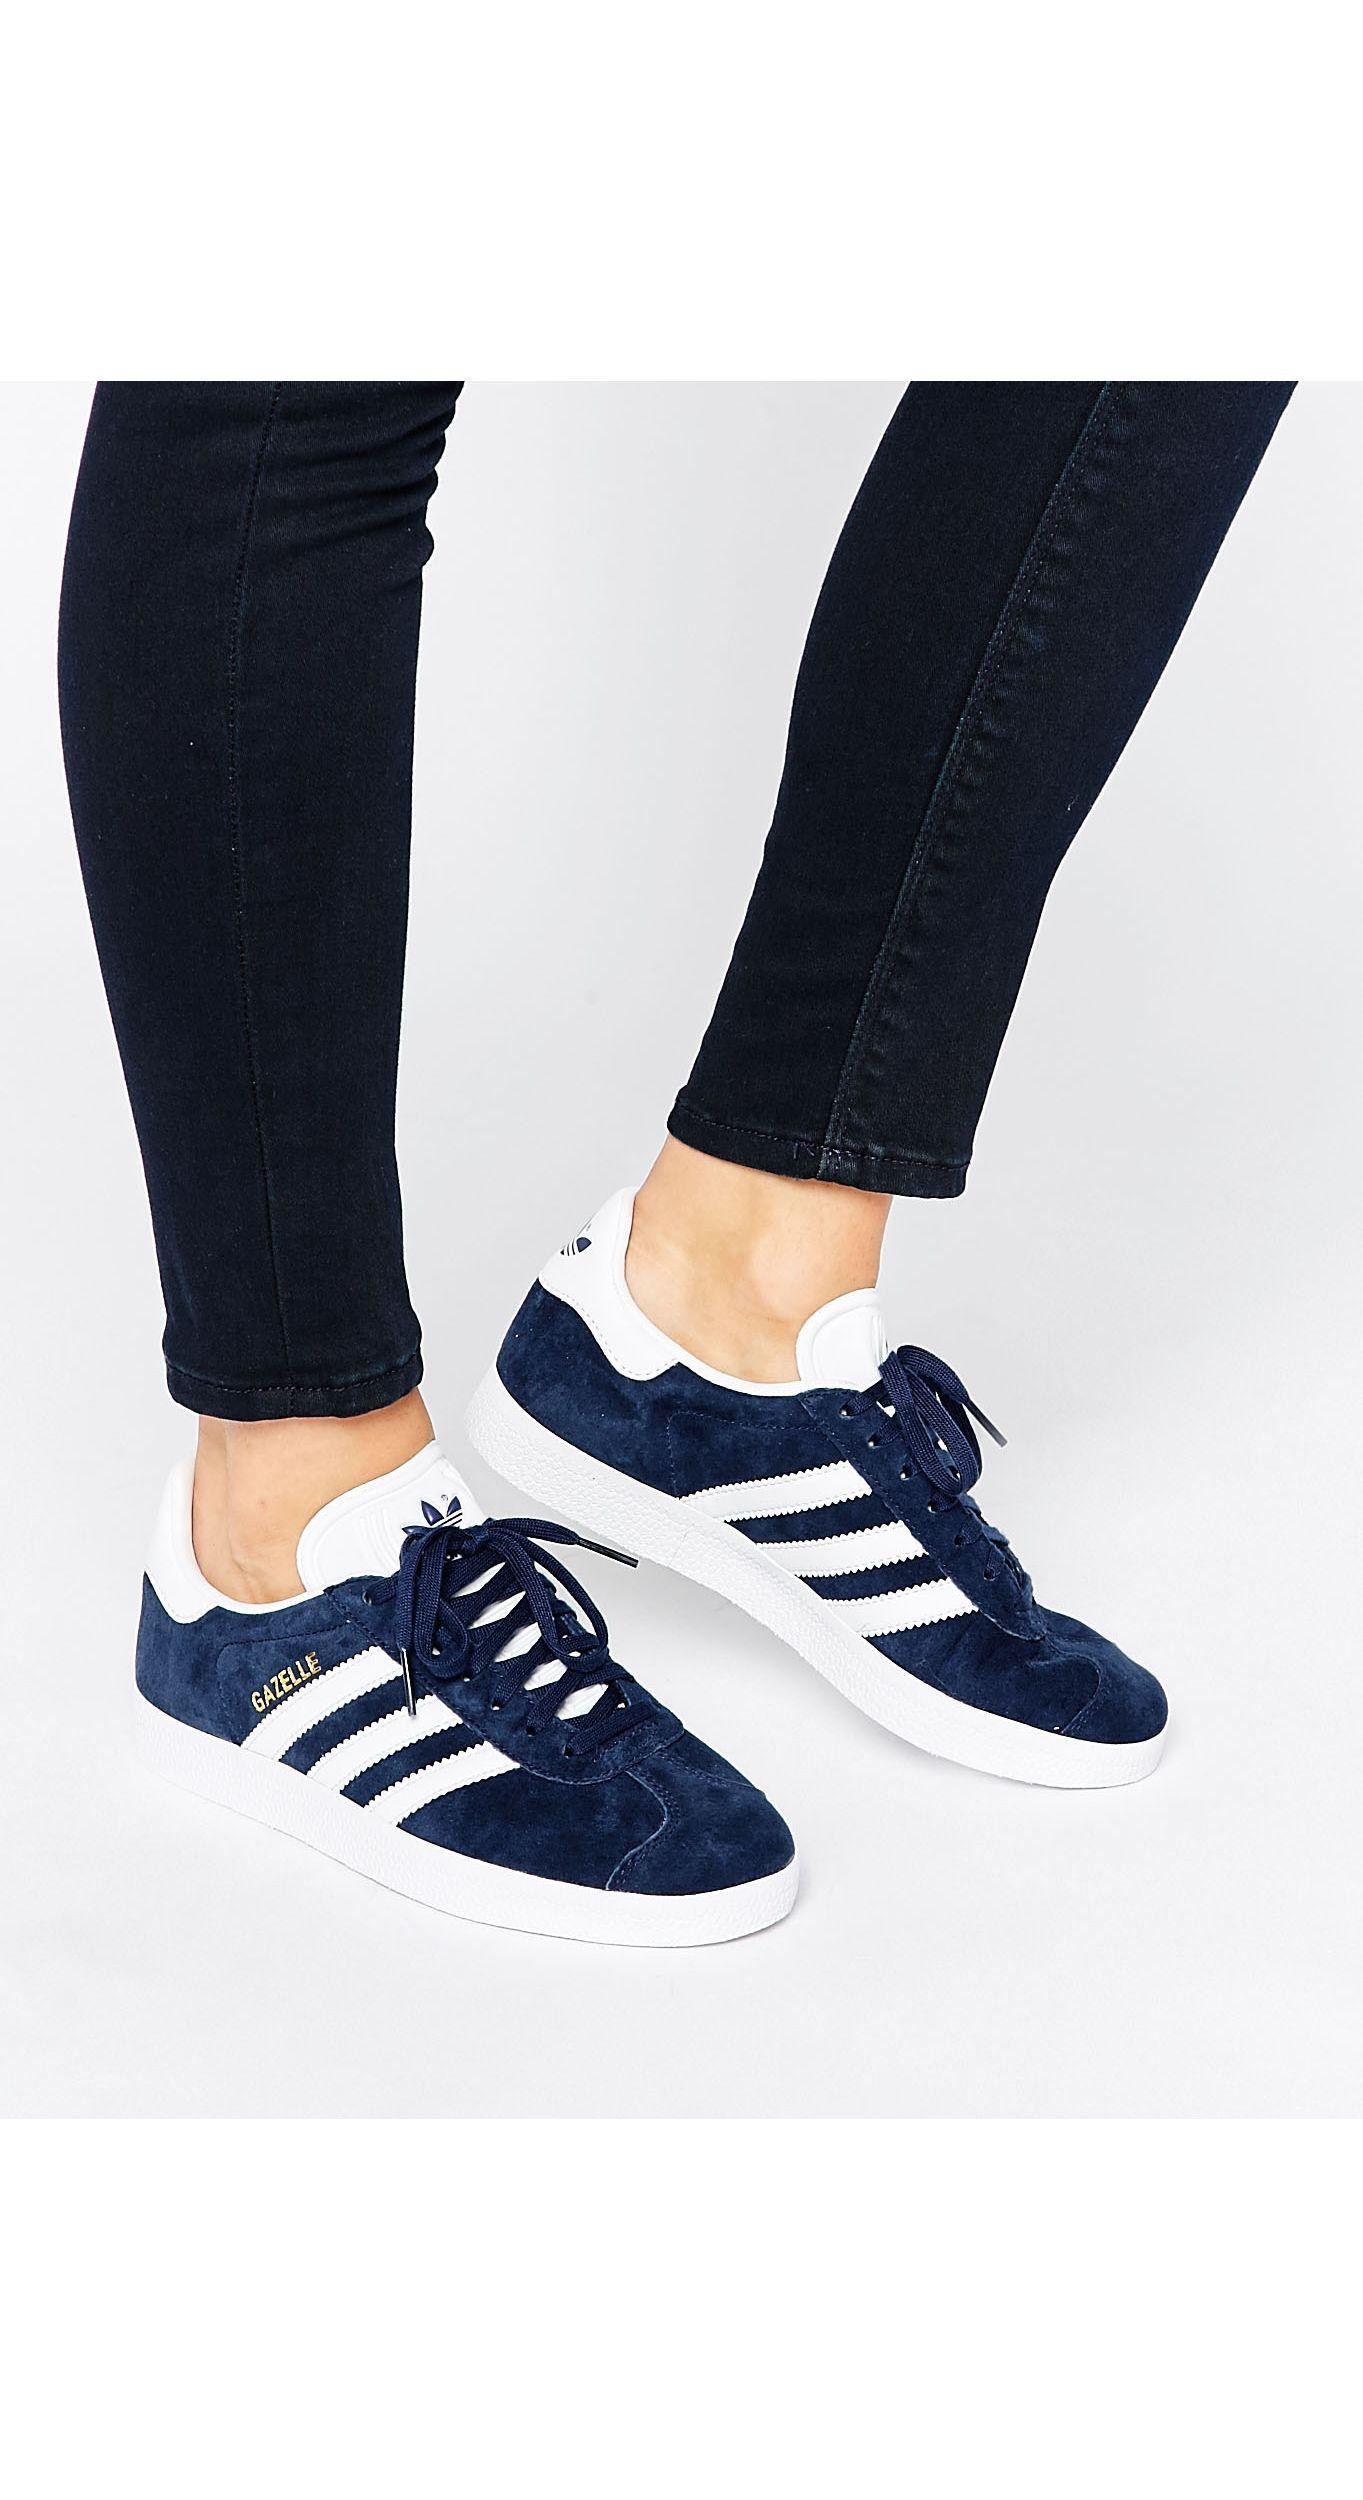 adidas Originals Navy Suede Gazelle Sneakers in Blue - Save 41% - Lyst